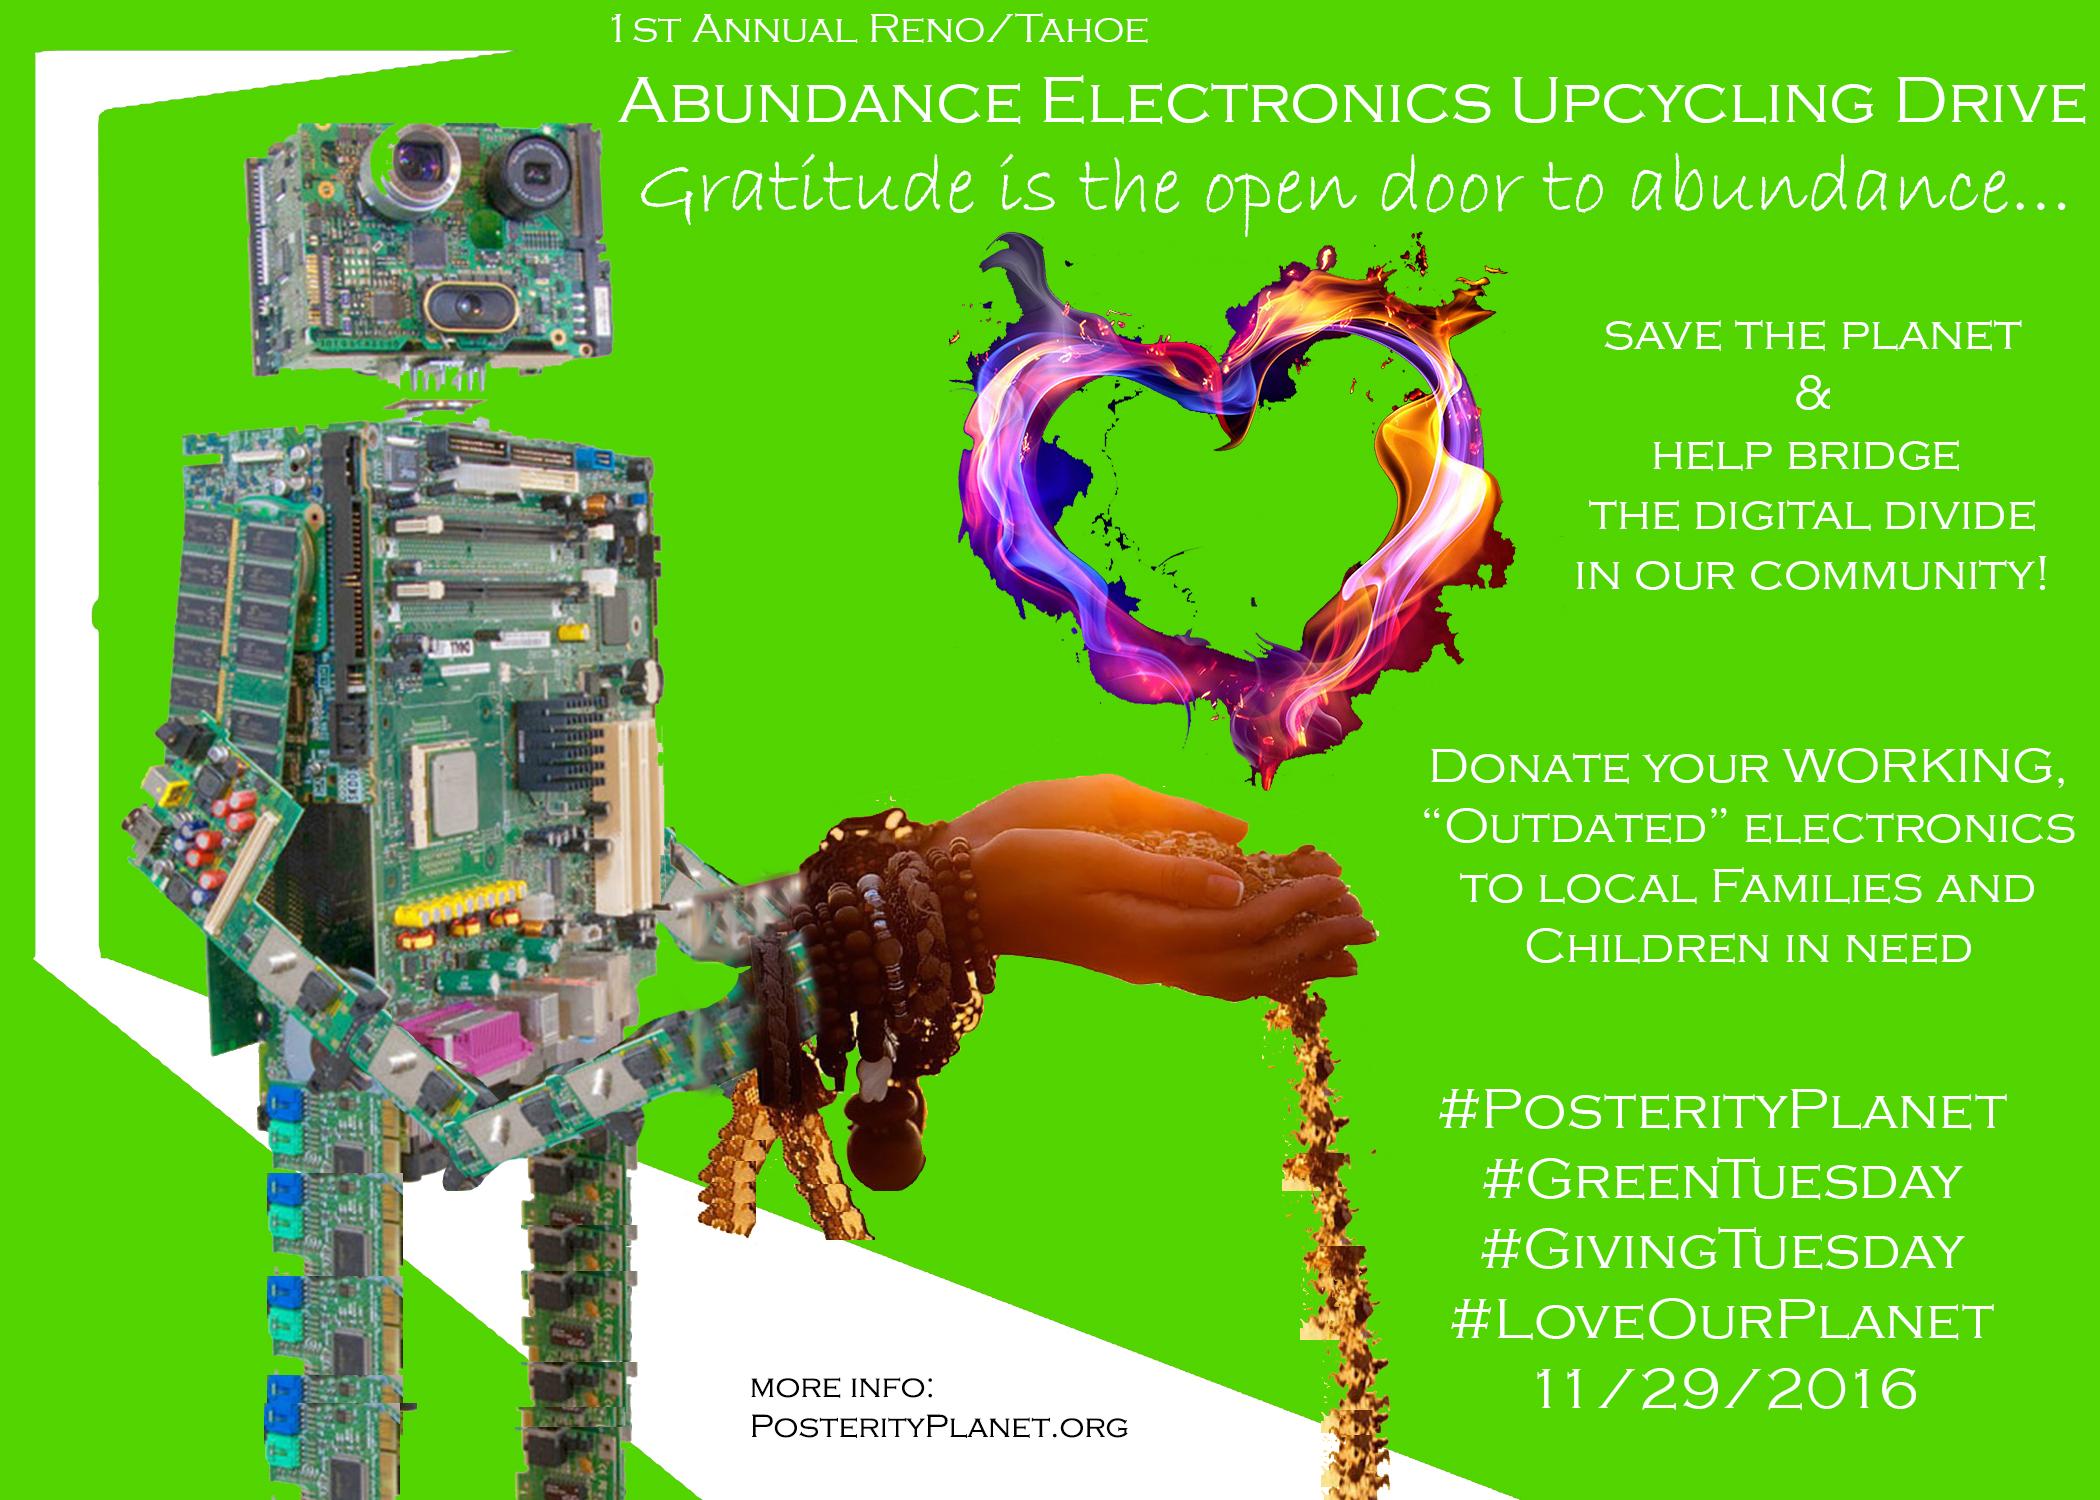 Abundance Electronics Upcycling Event Reno 2016